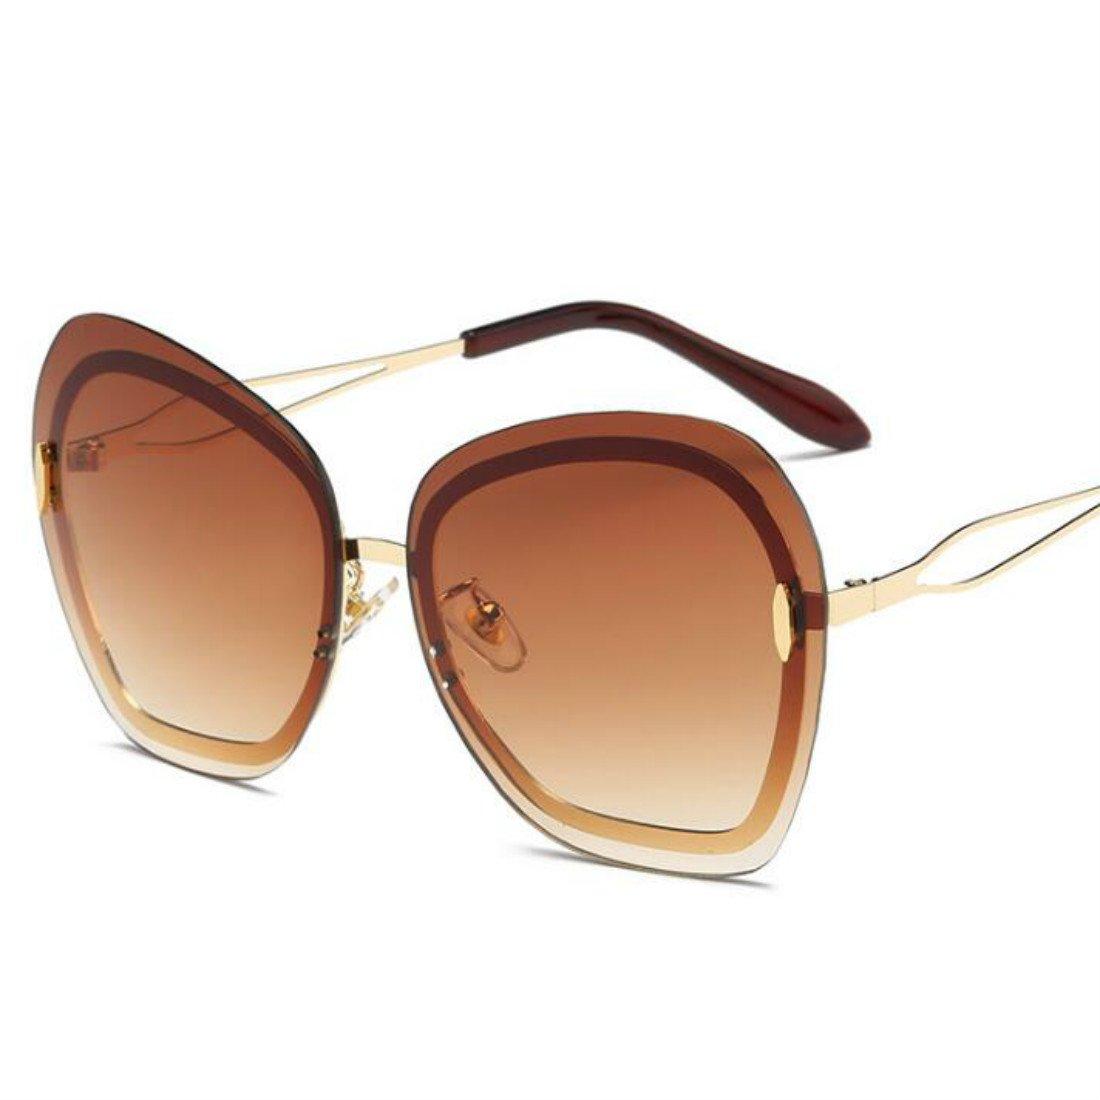 Colygamala Women's Classic Chic Rimless Sunglasses / Metallic Line Accent Oversized Sunglasses 2018012703-t